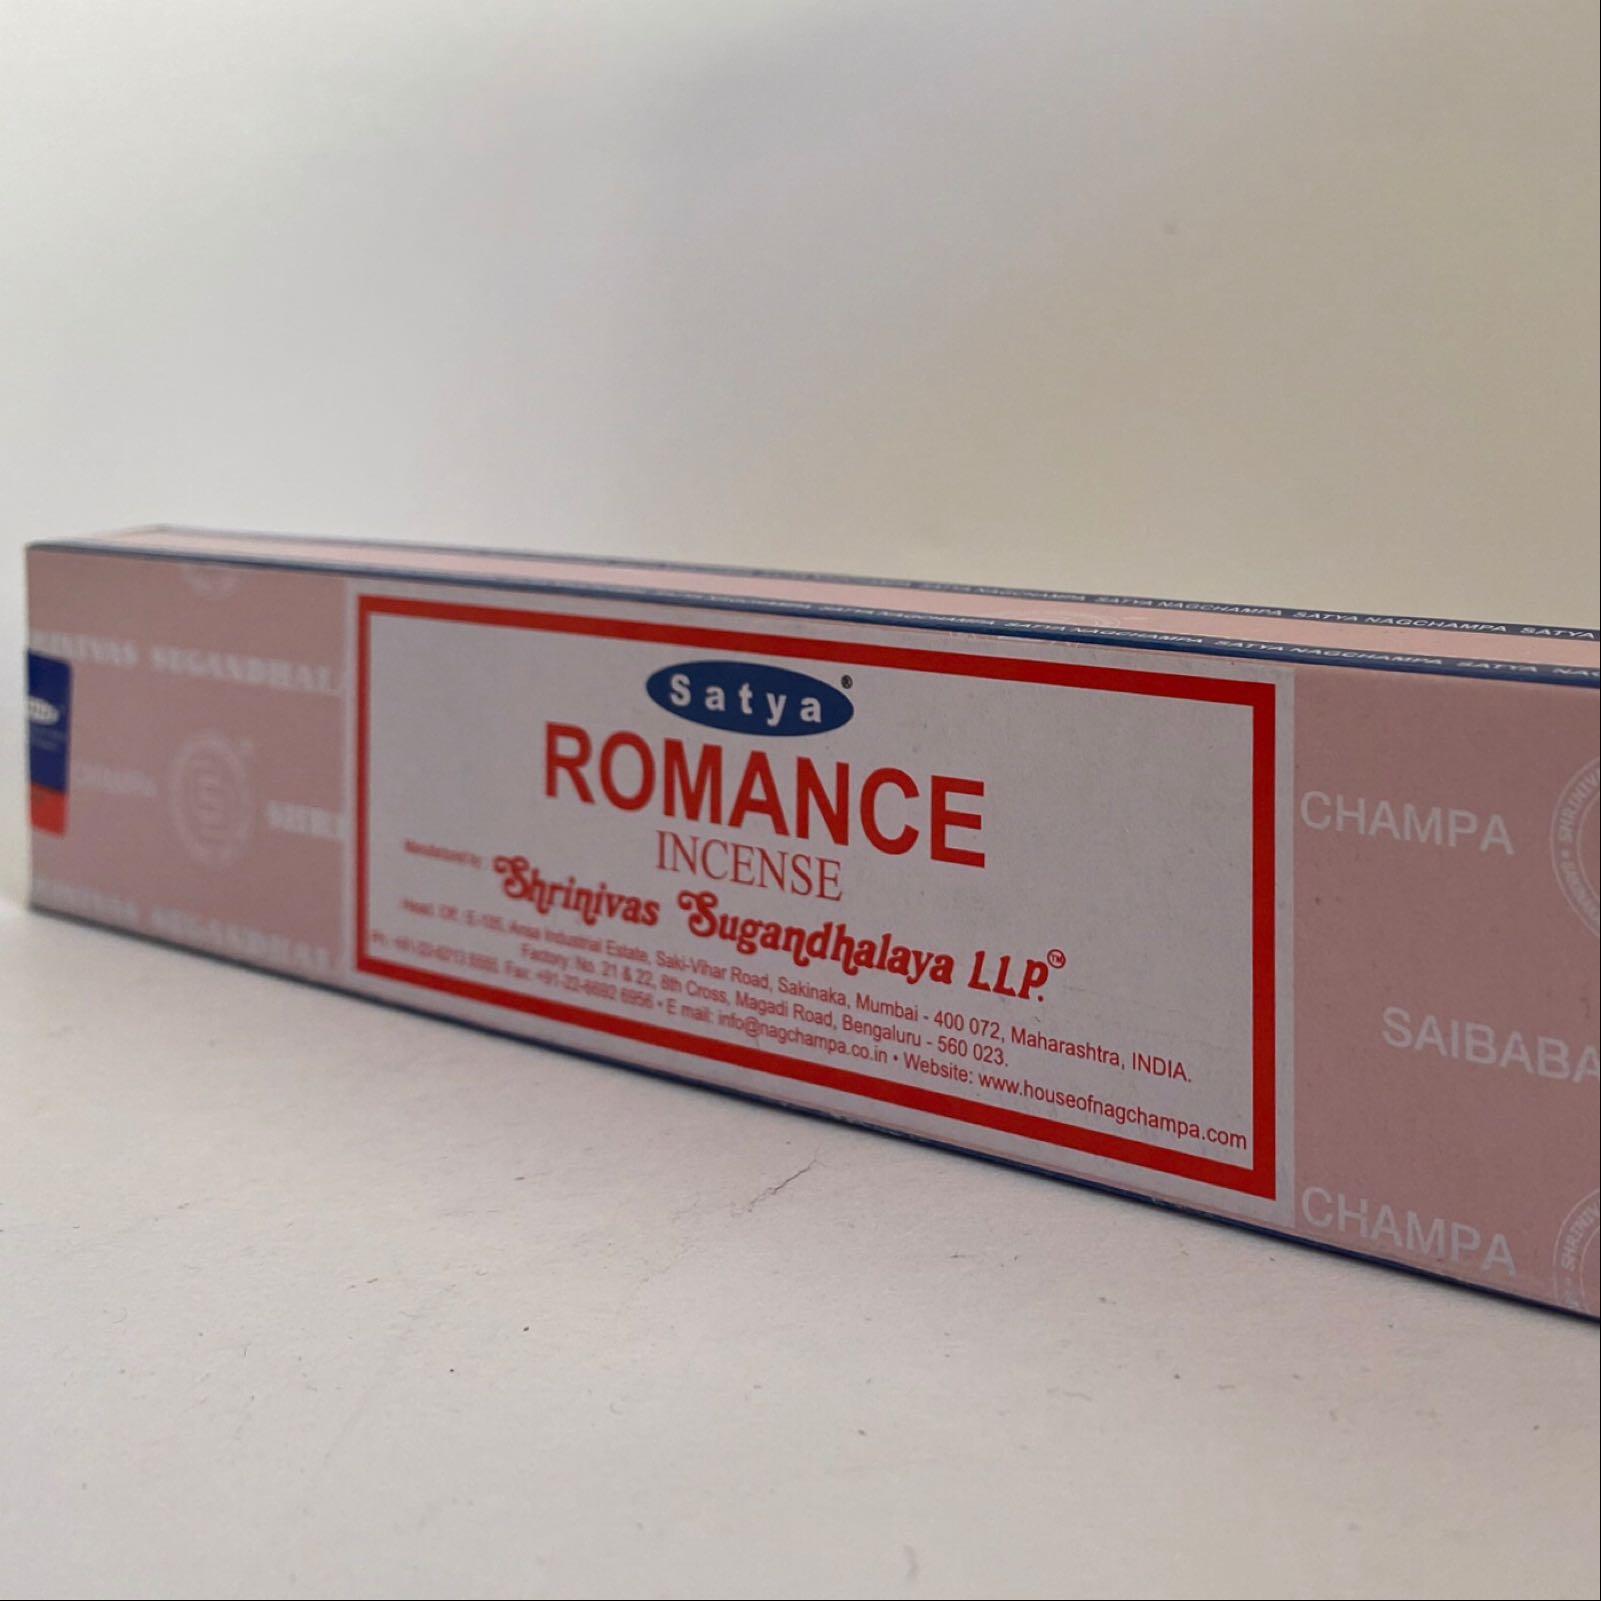 'Romance' Incense Sticks